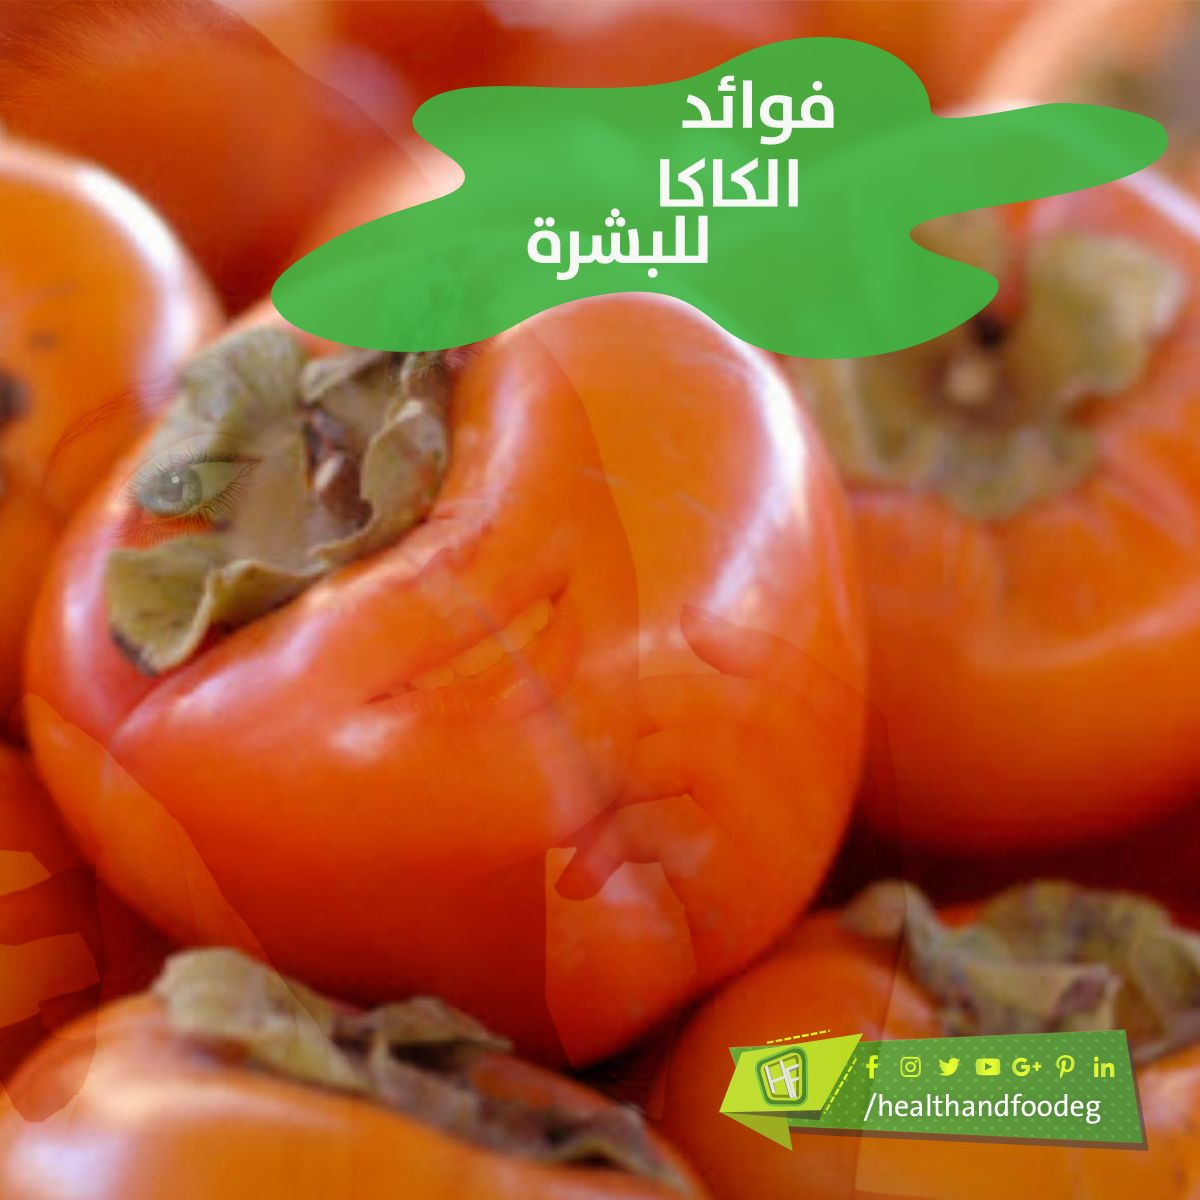 ما فوائد الكاكا للبشرة Stuffed Peppers Persimmon Vegetables